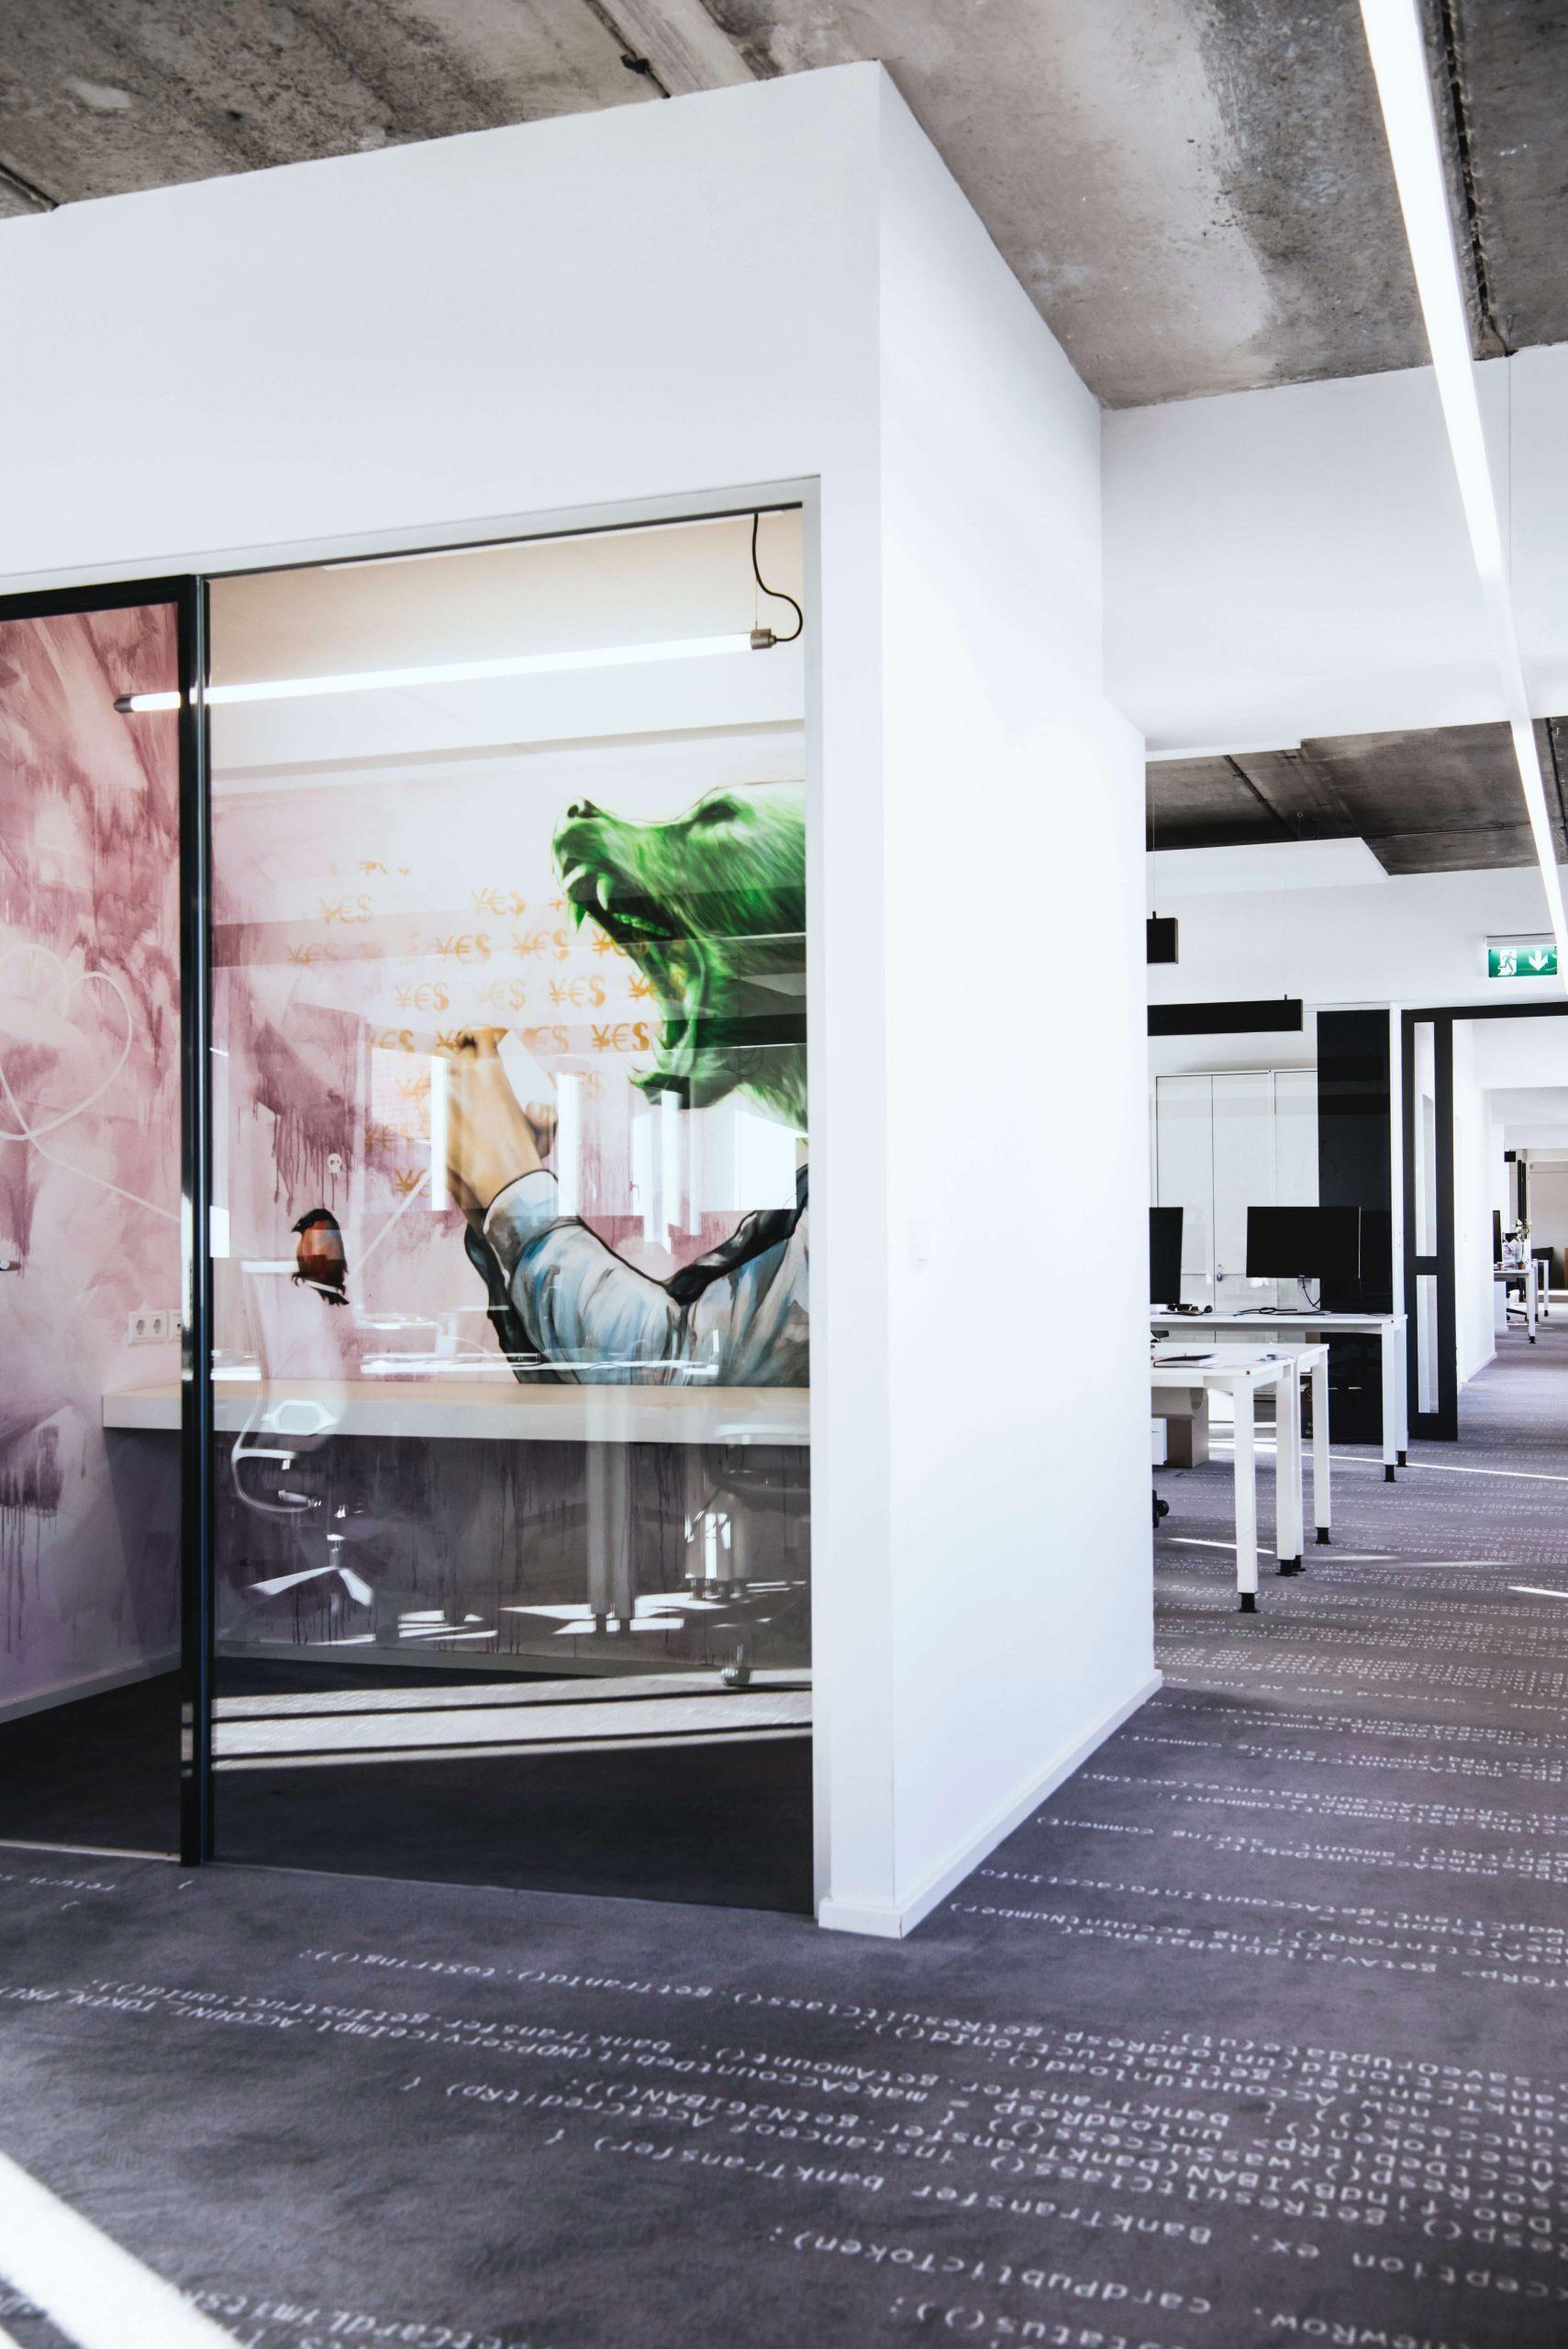 New Work Büro Startup N26 Architekturbüro TKEZ Flur mit Graffiti